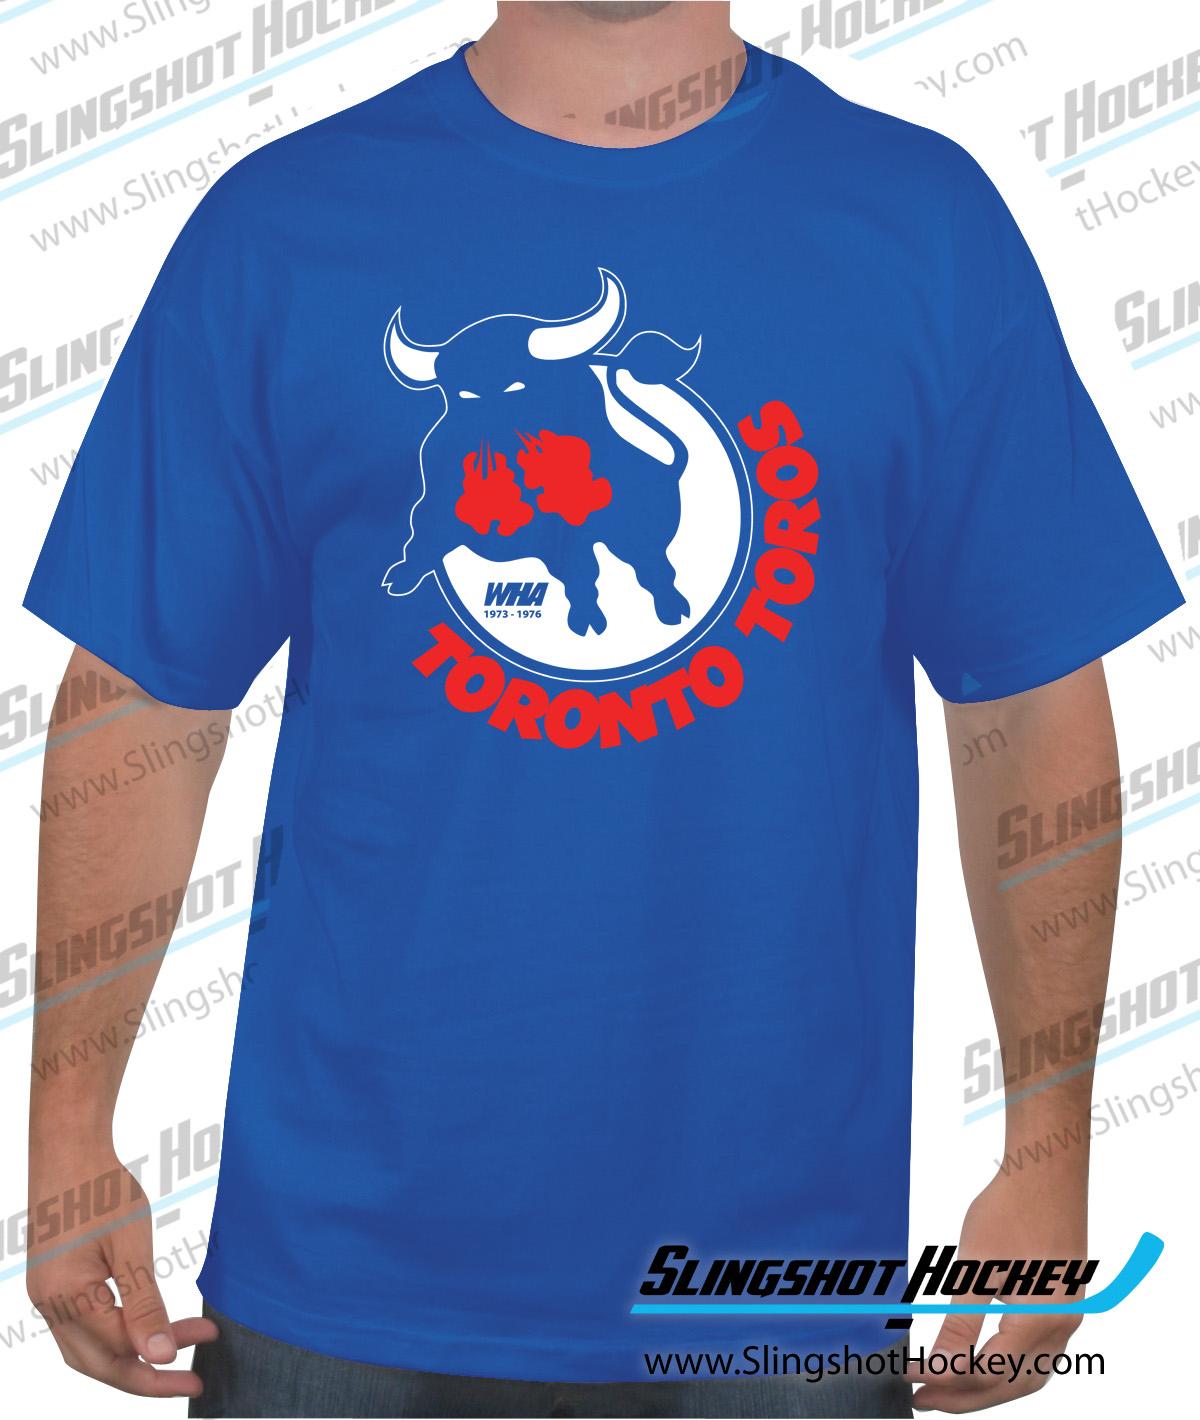 "cdfc988692 Toronto Toros. Shop now for your ""Toronto Toros"" WHA 1973 to 1976 hockey t- shirt."